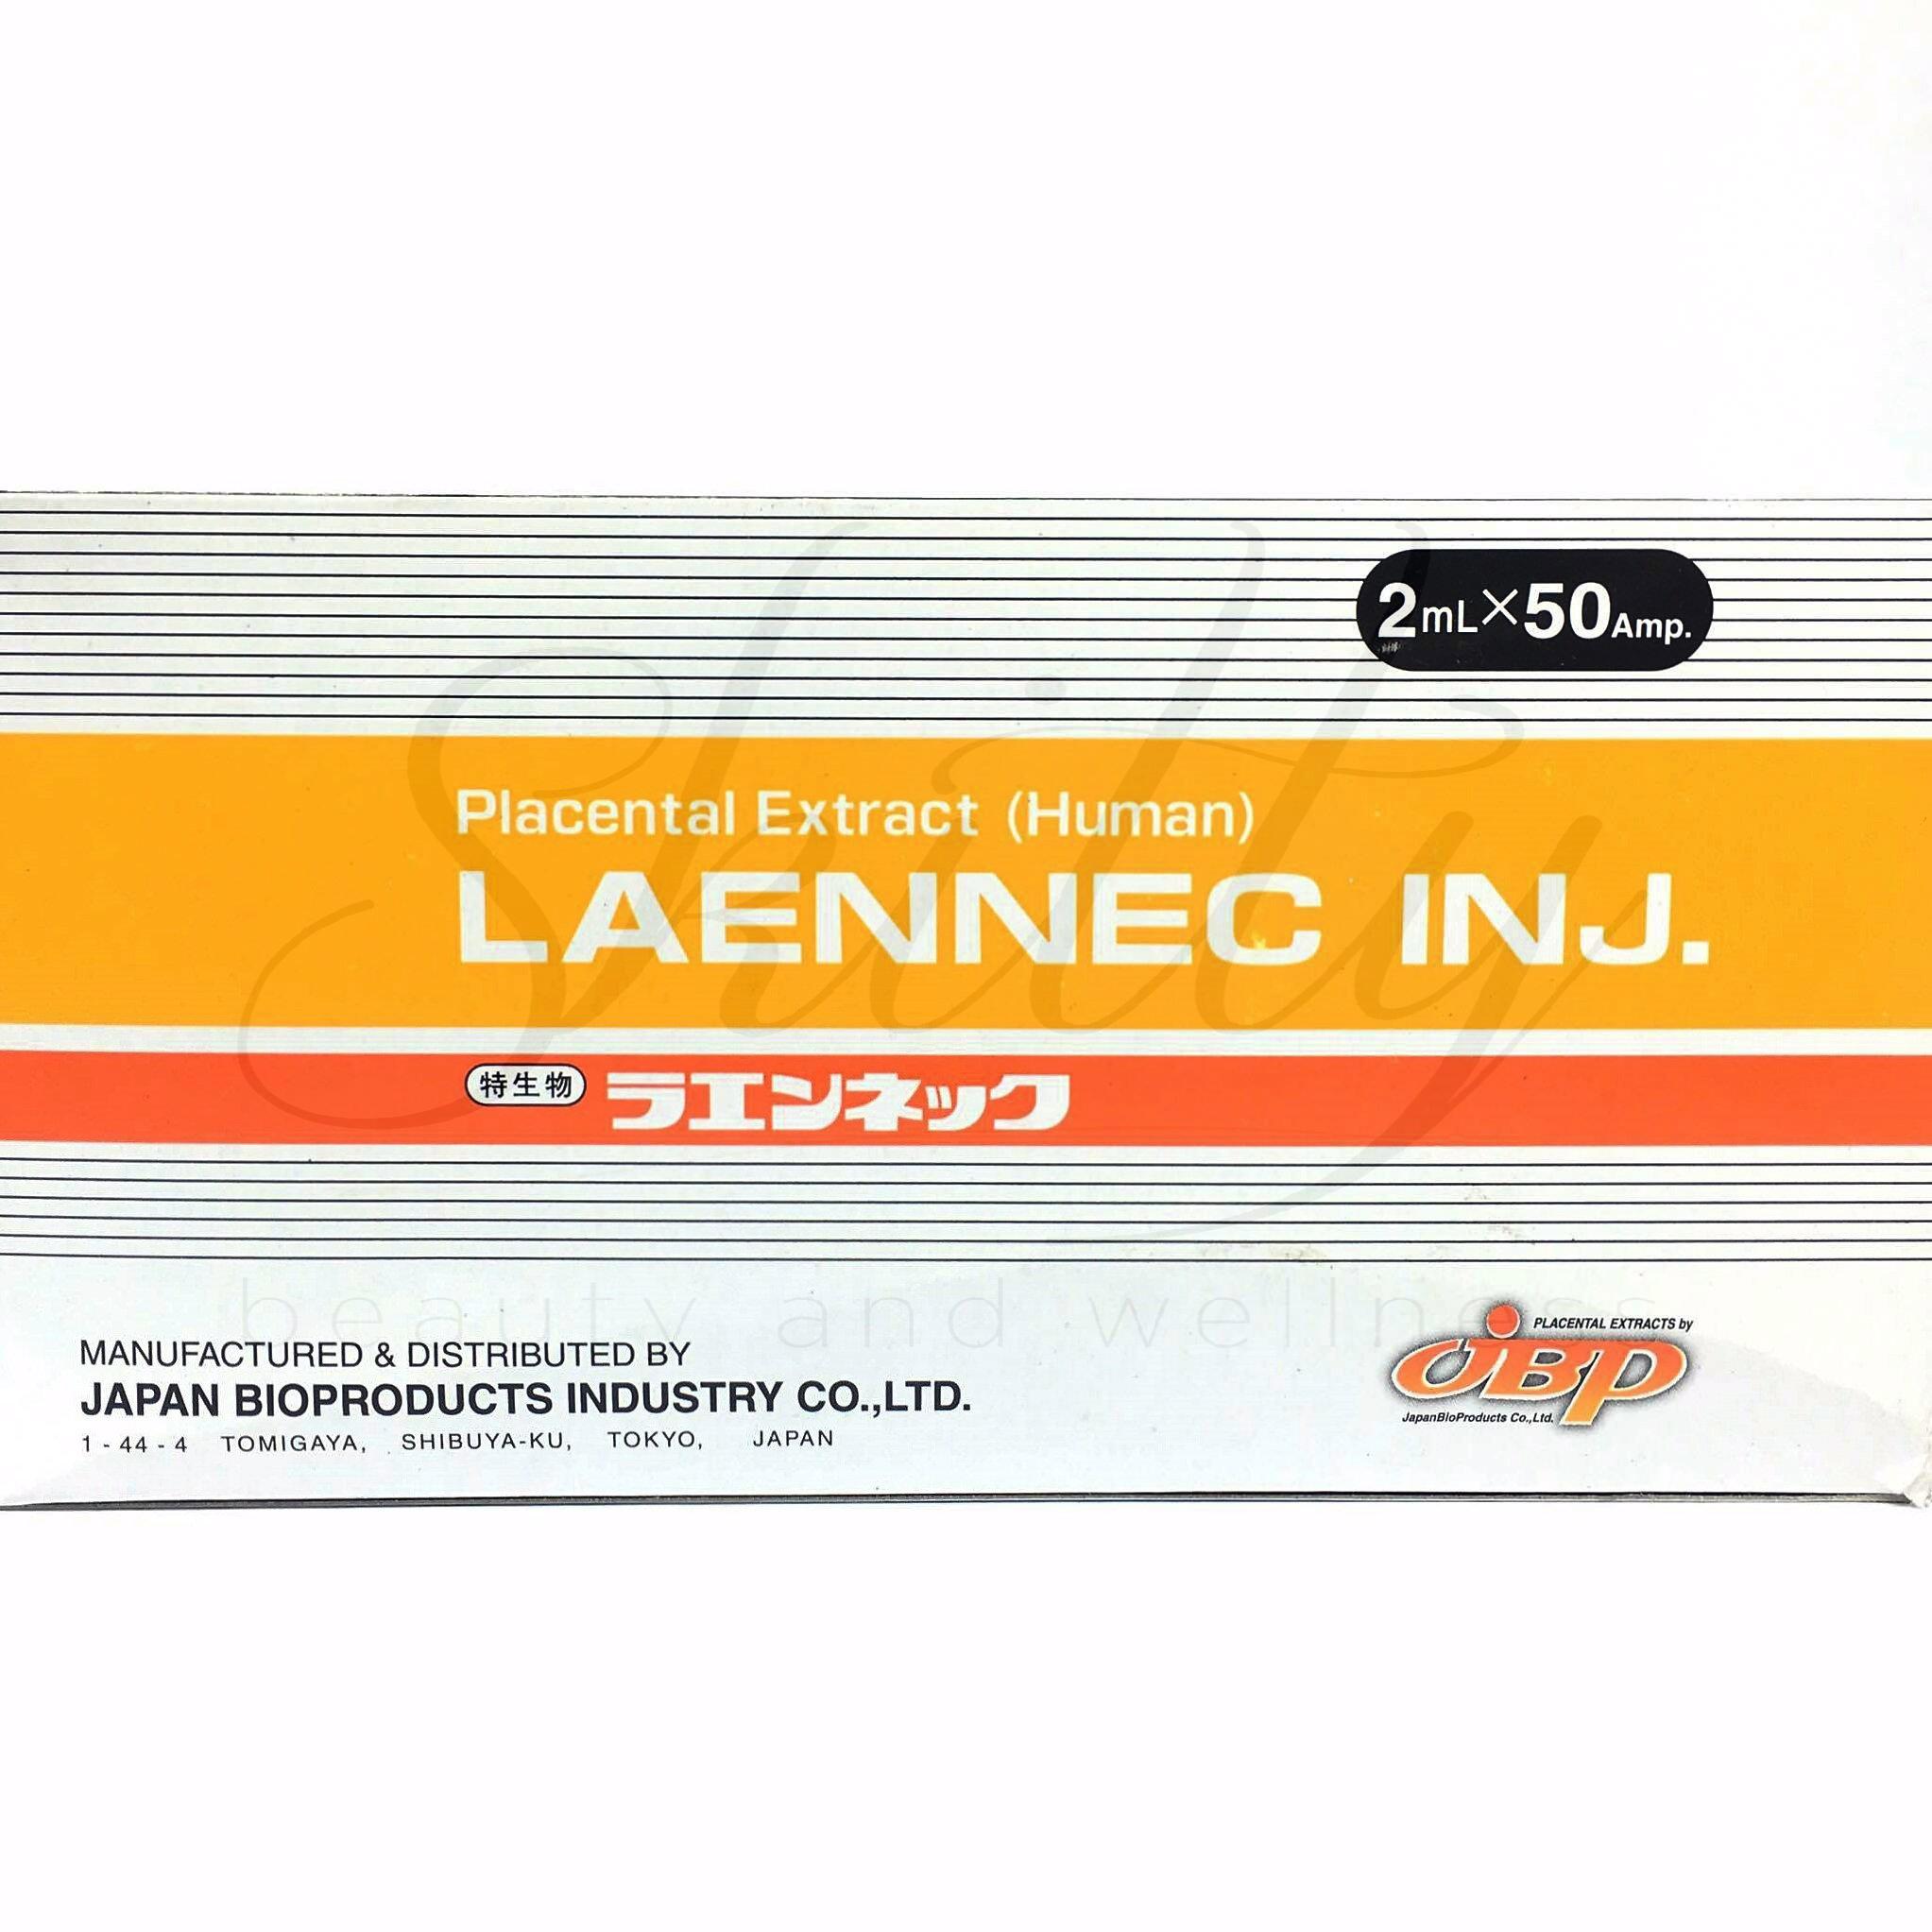 Laennec